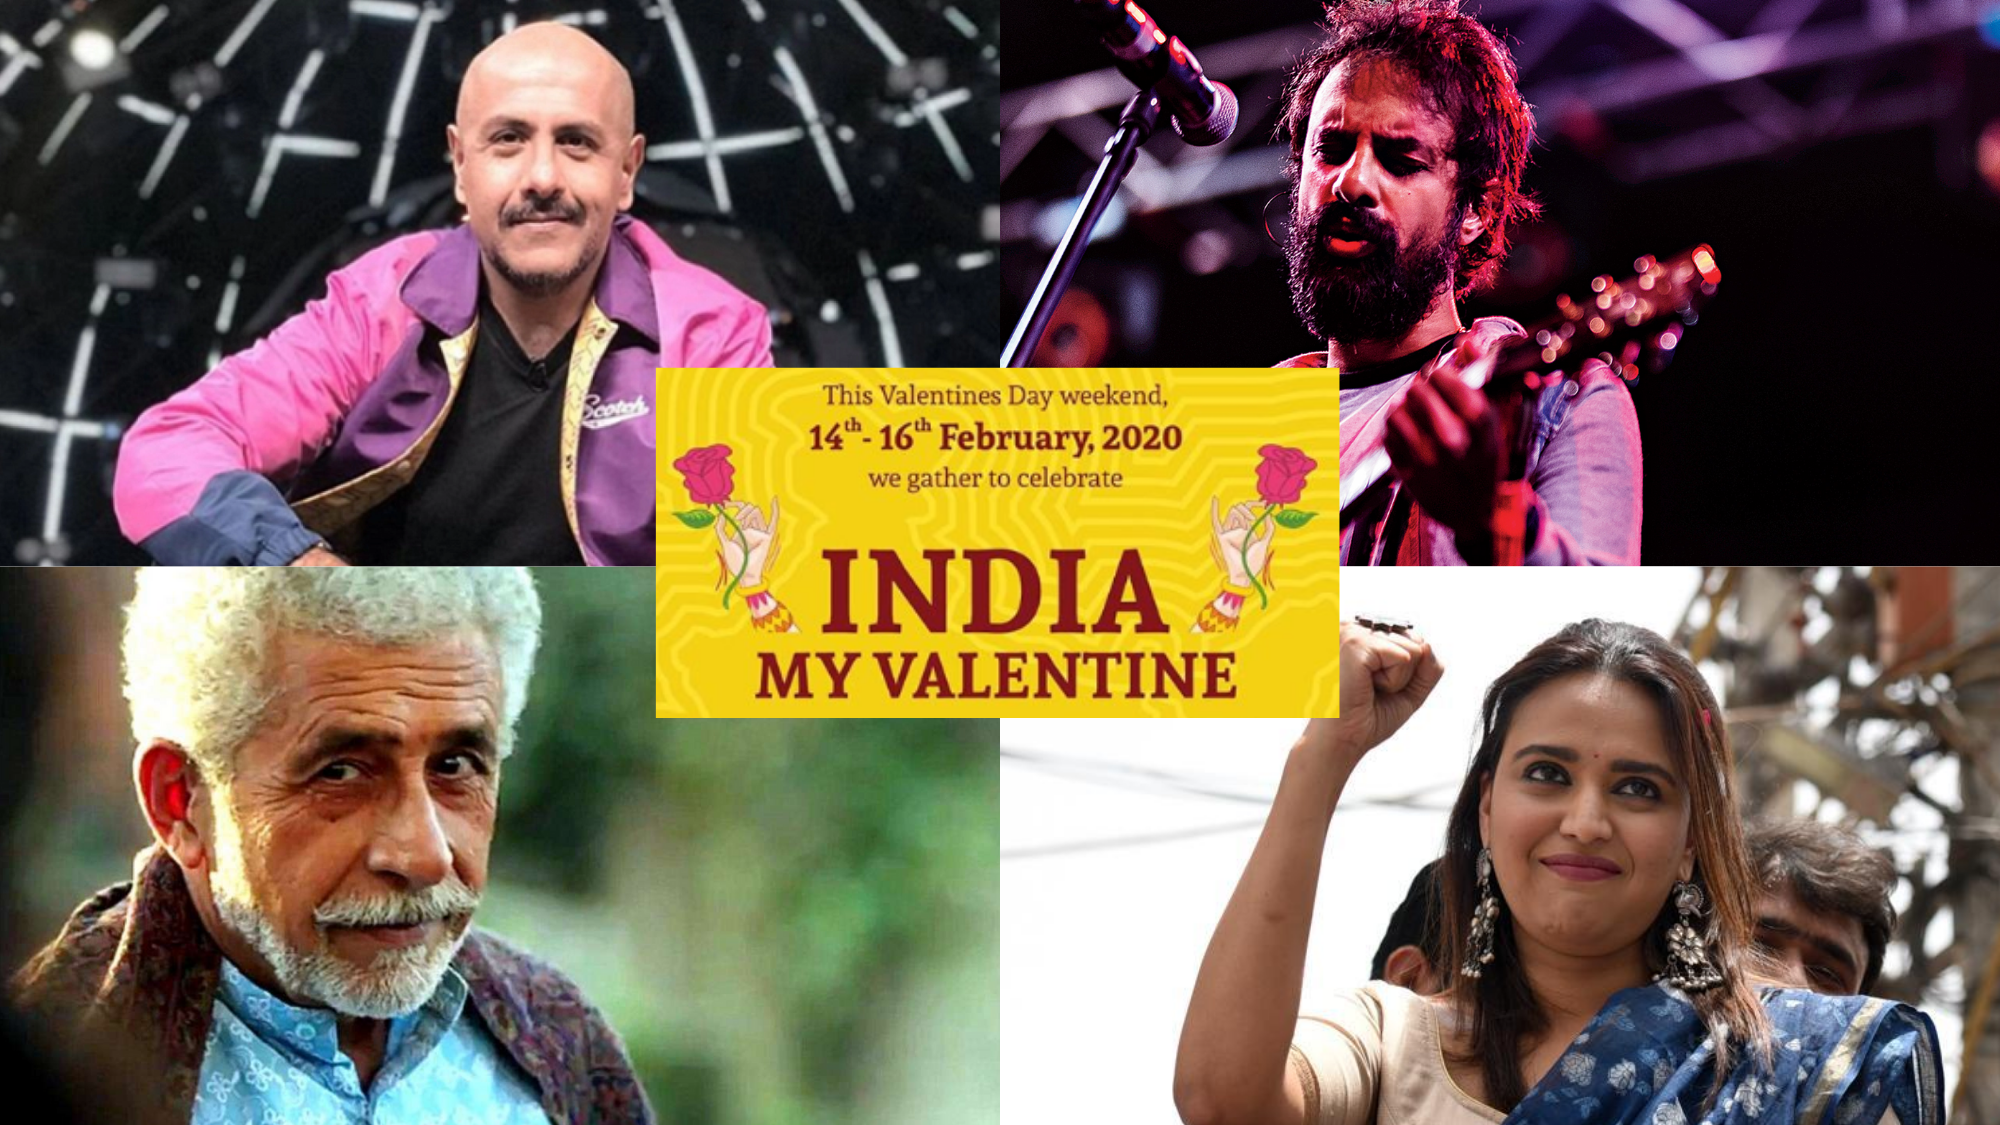 On Valentine's Day Weekend, Artists Unite to Cherish Idea of India